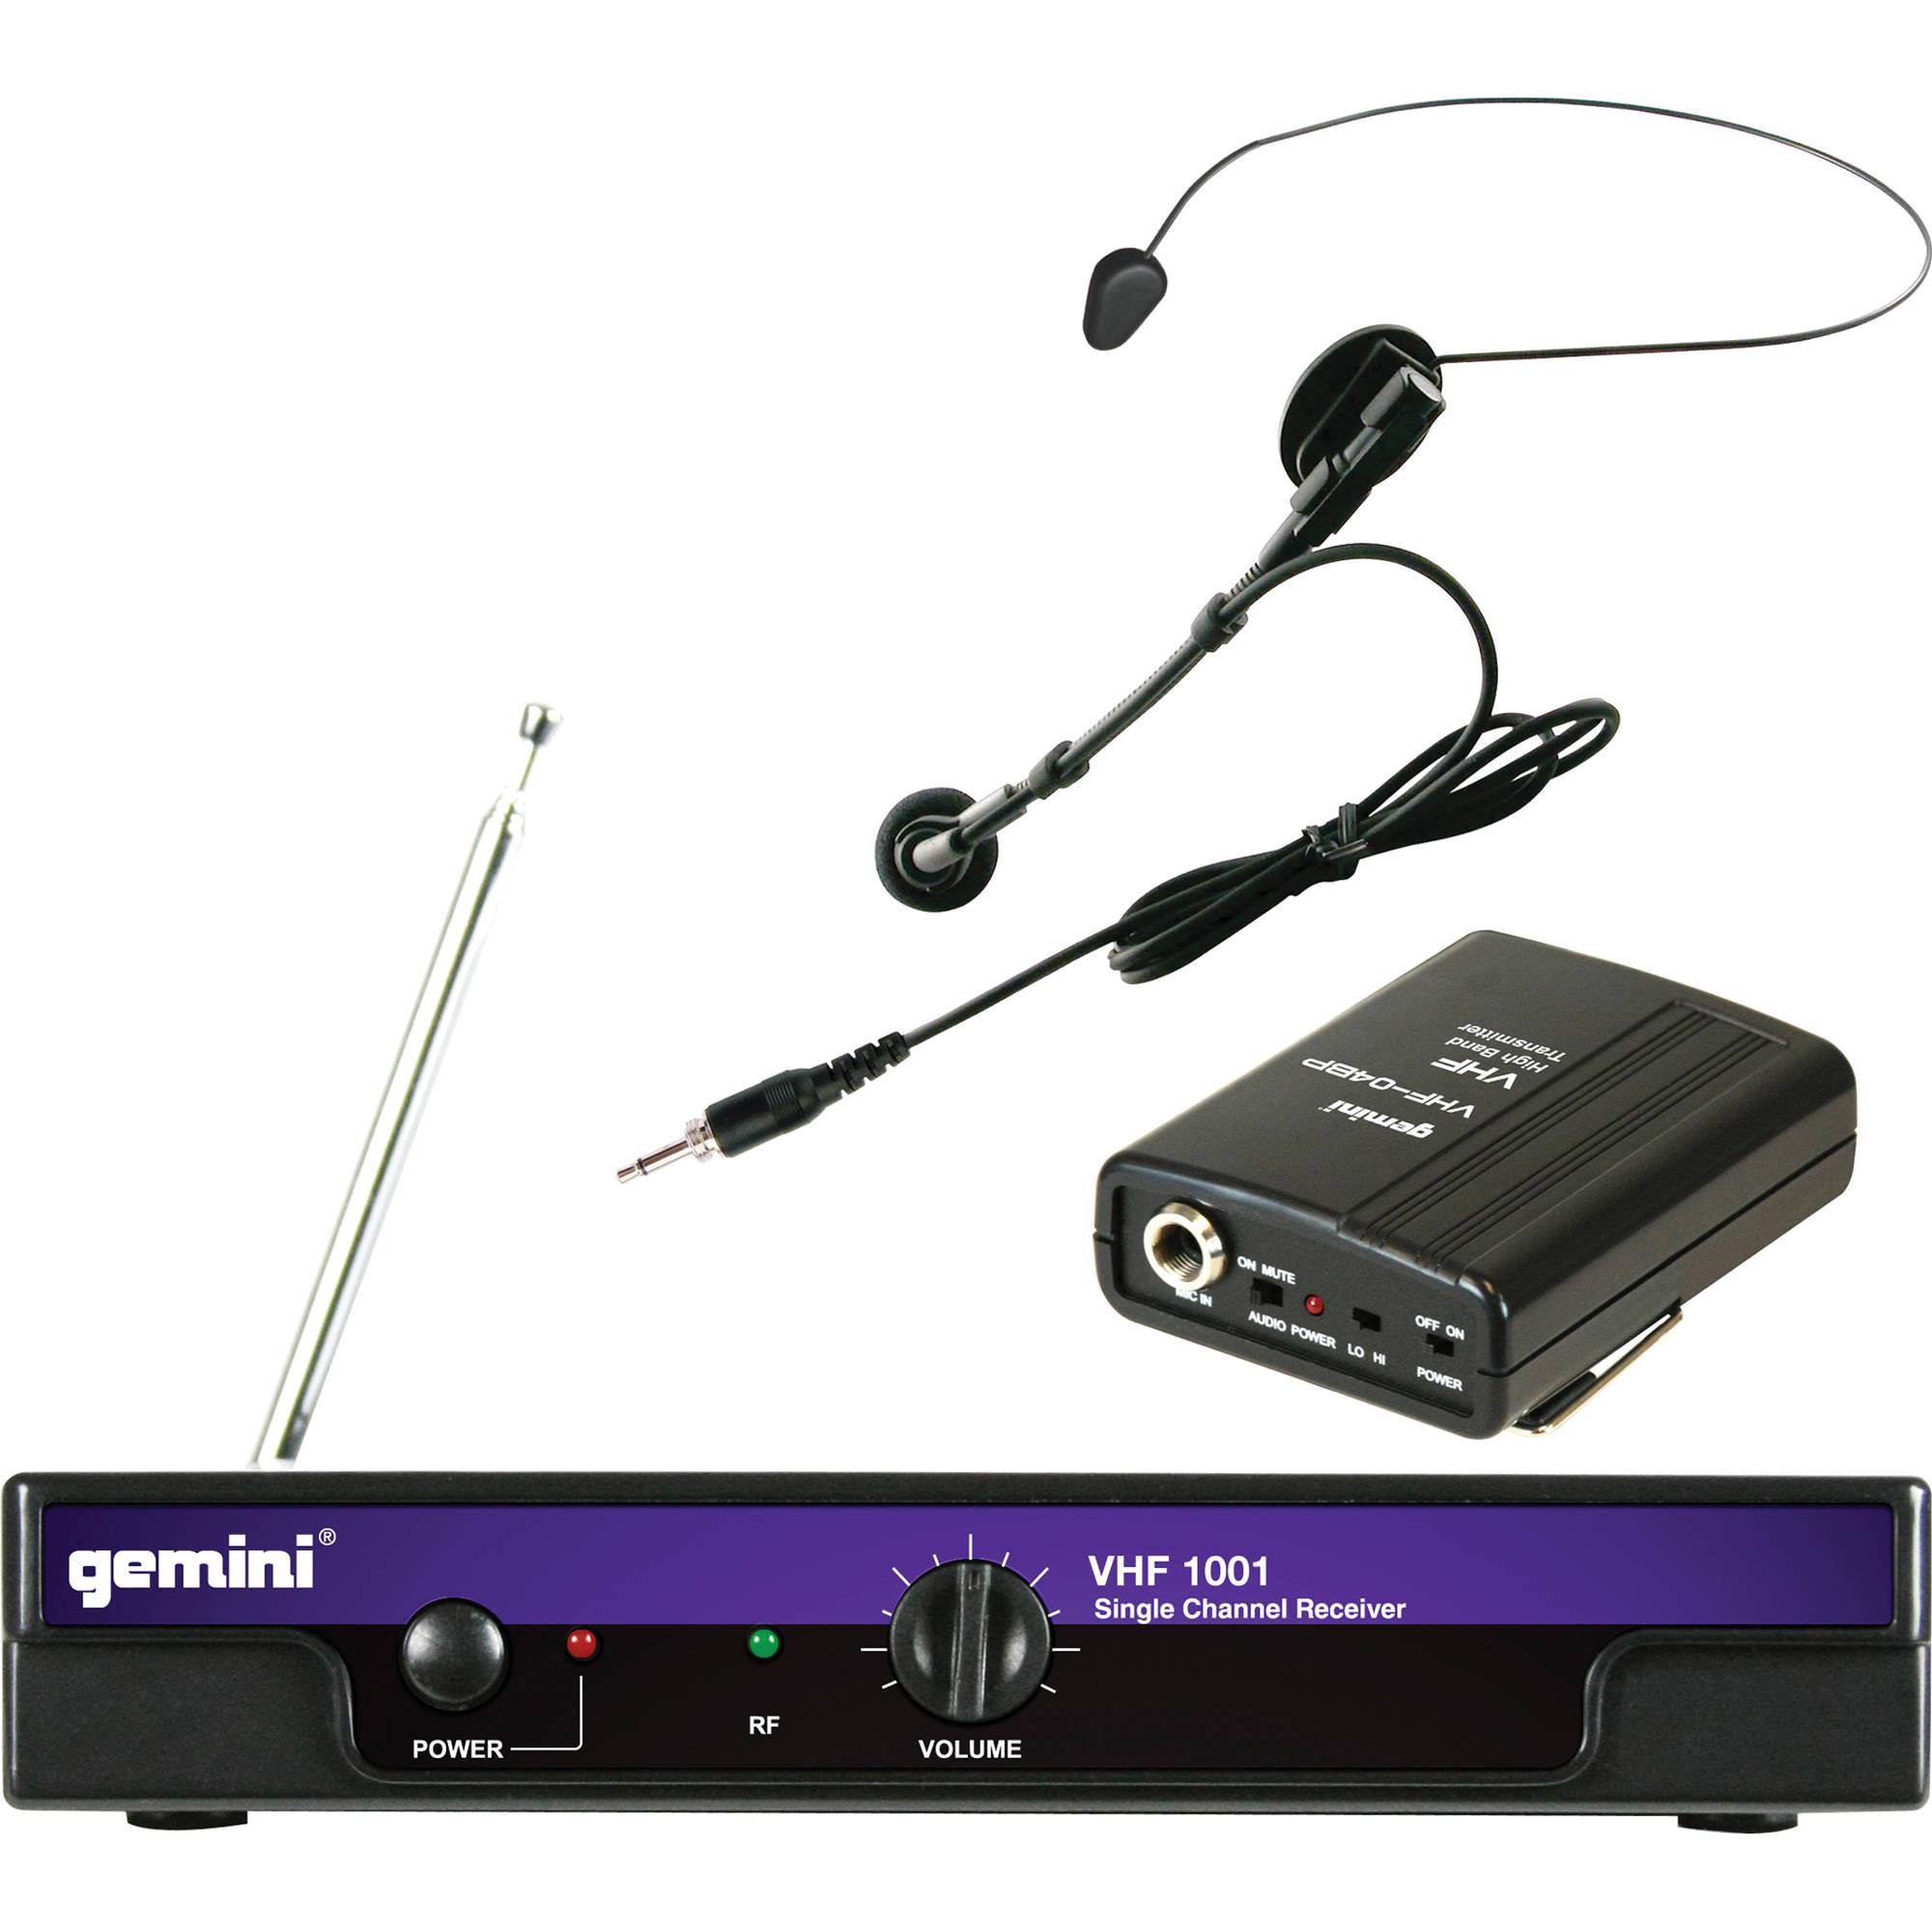 Gimini Wirerless Mic Head Data Wiring Filter 07controls Top Panel 09motor 01cover 10wiring Diagram Gemini Vhf 1001hl Wireless Headset 186 6 Rh Bhphotovideo Com